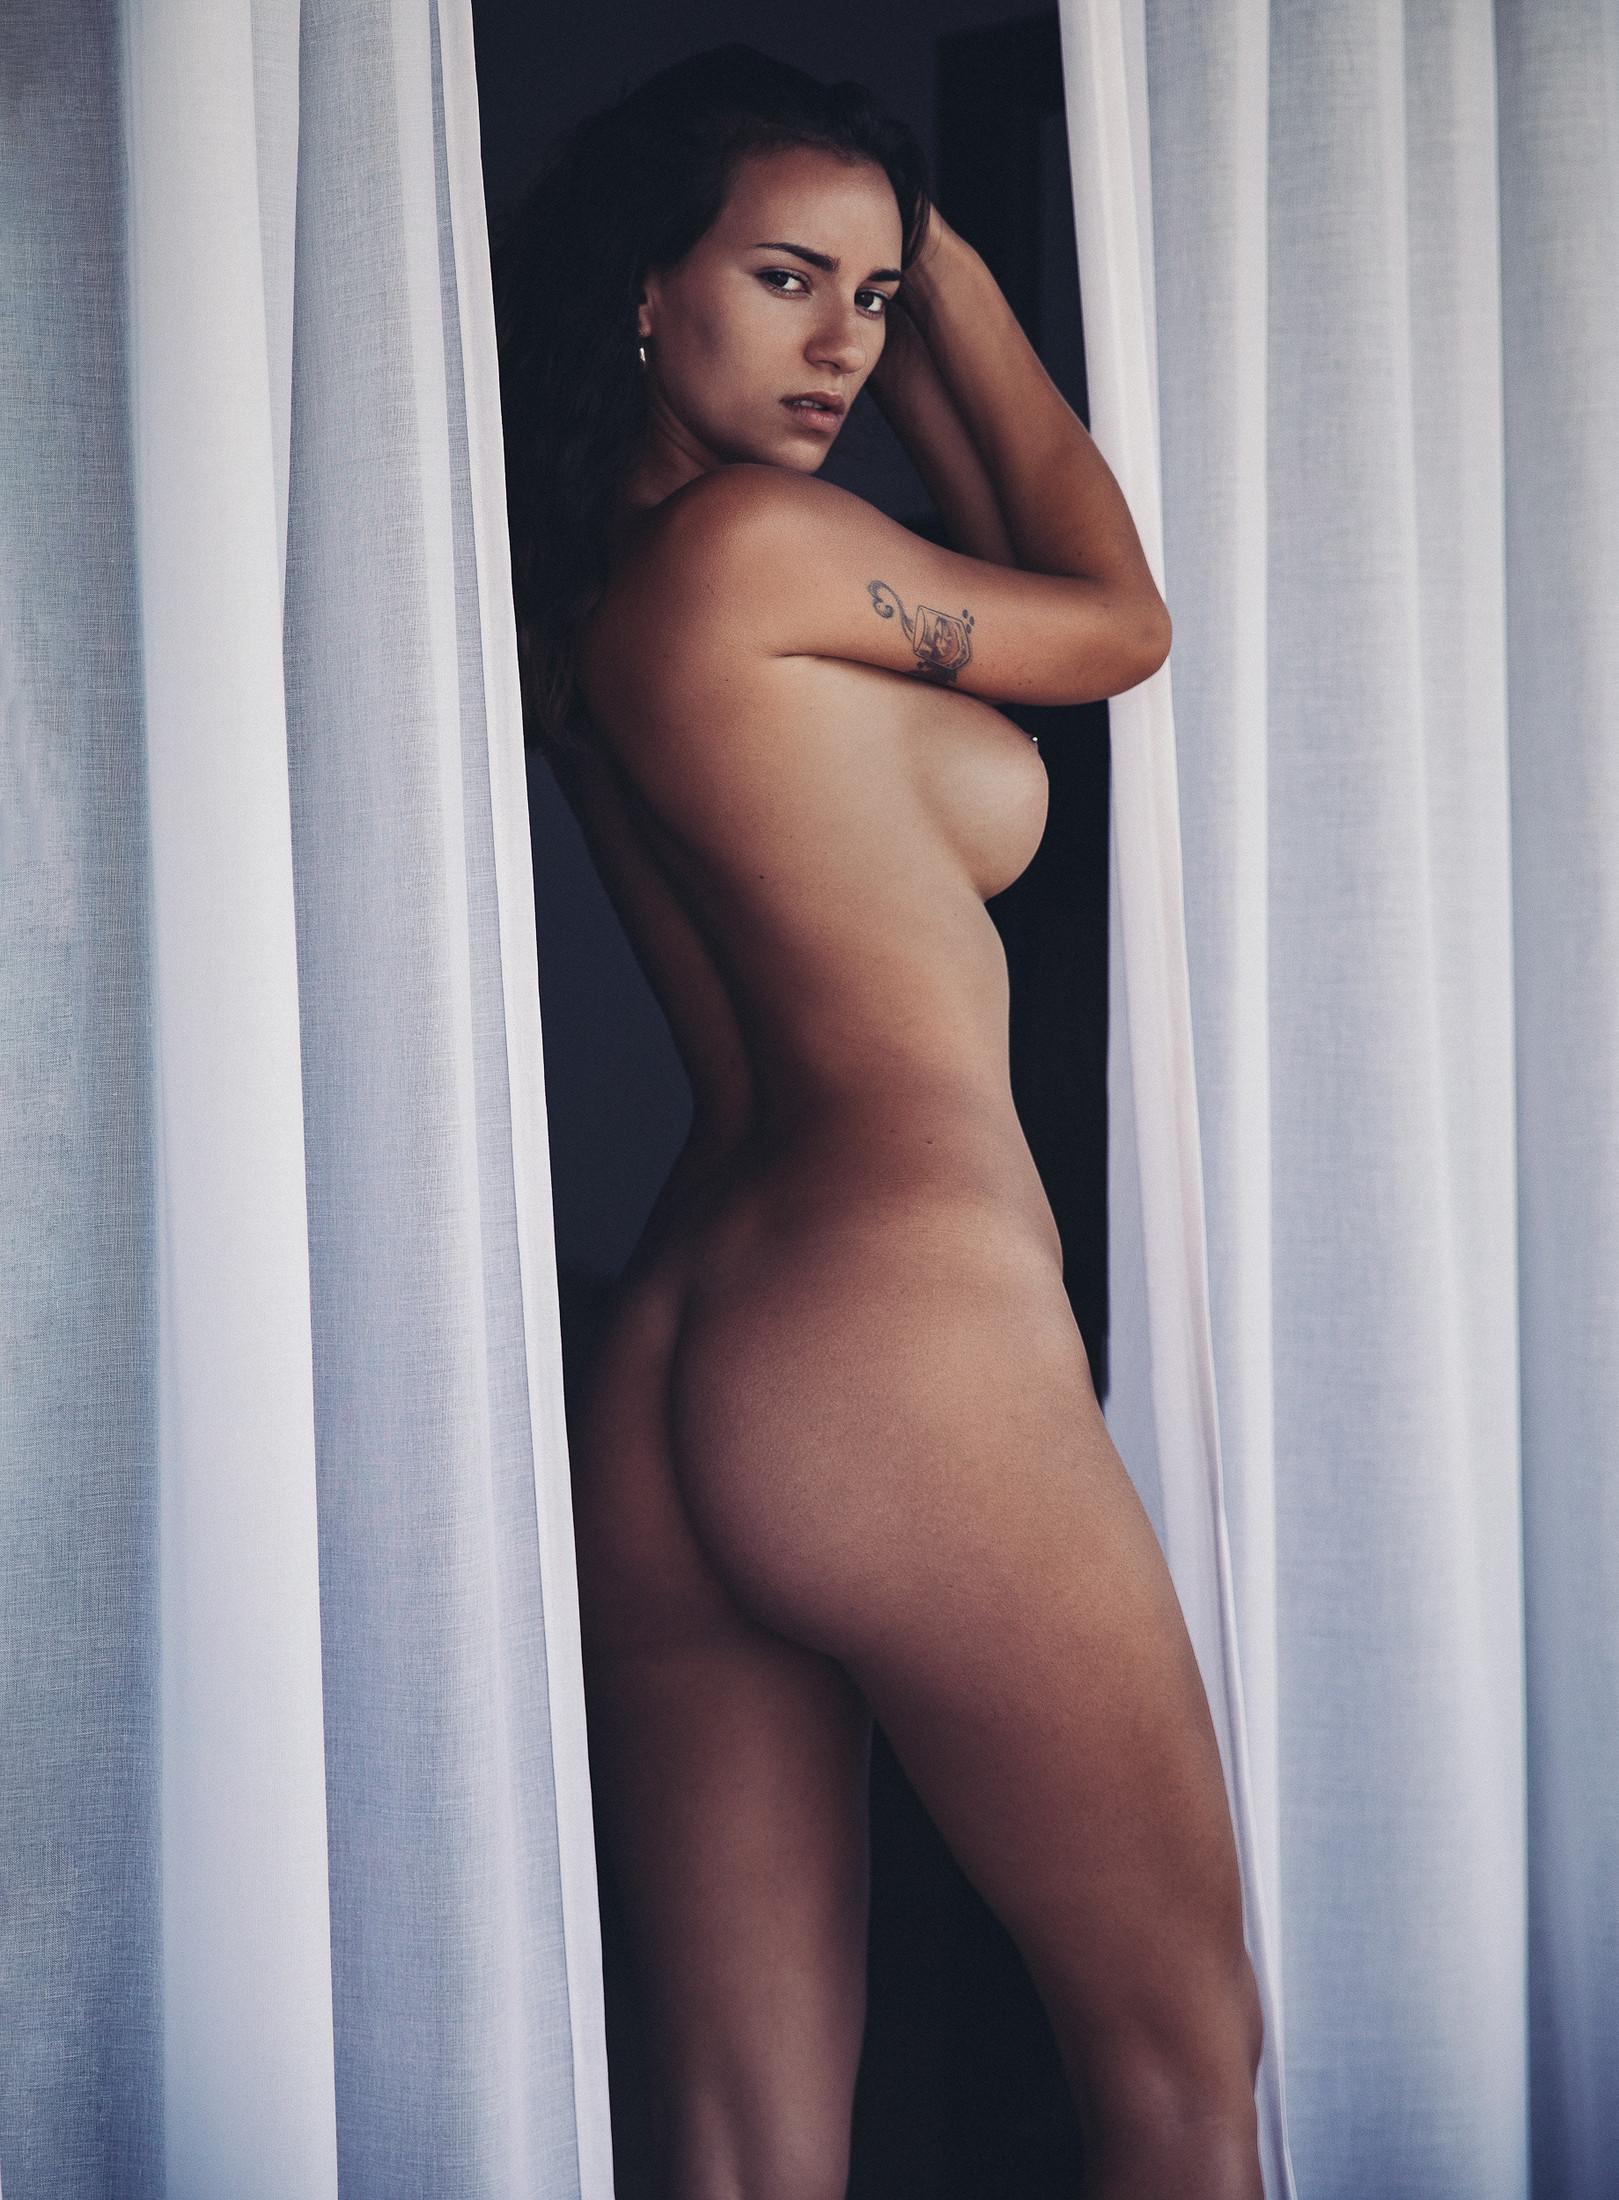 Lara - Thomas Agatz photoshoot